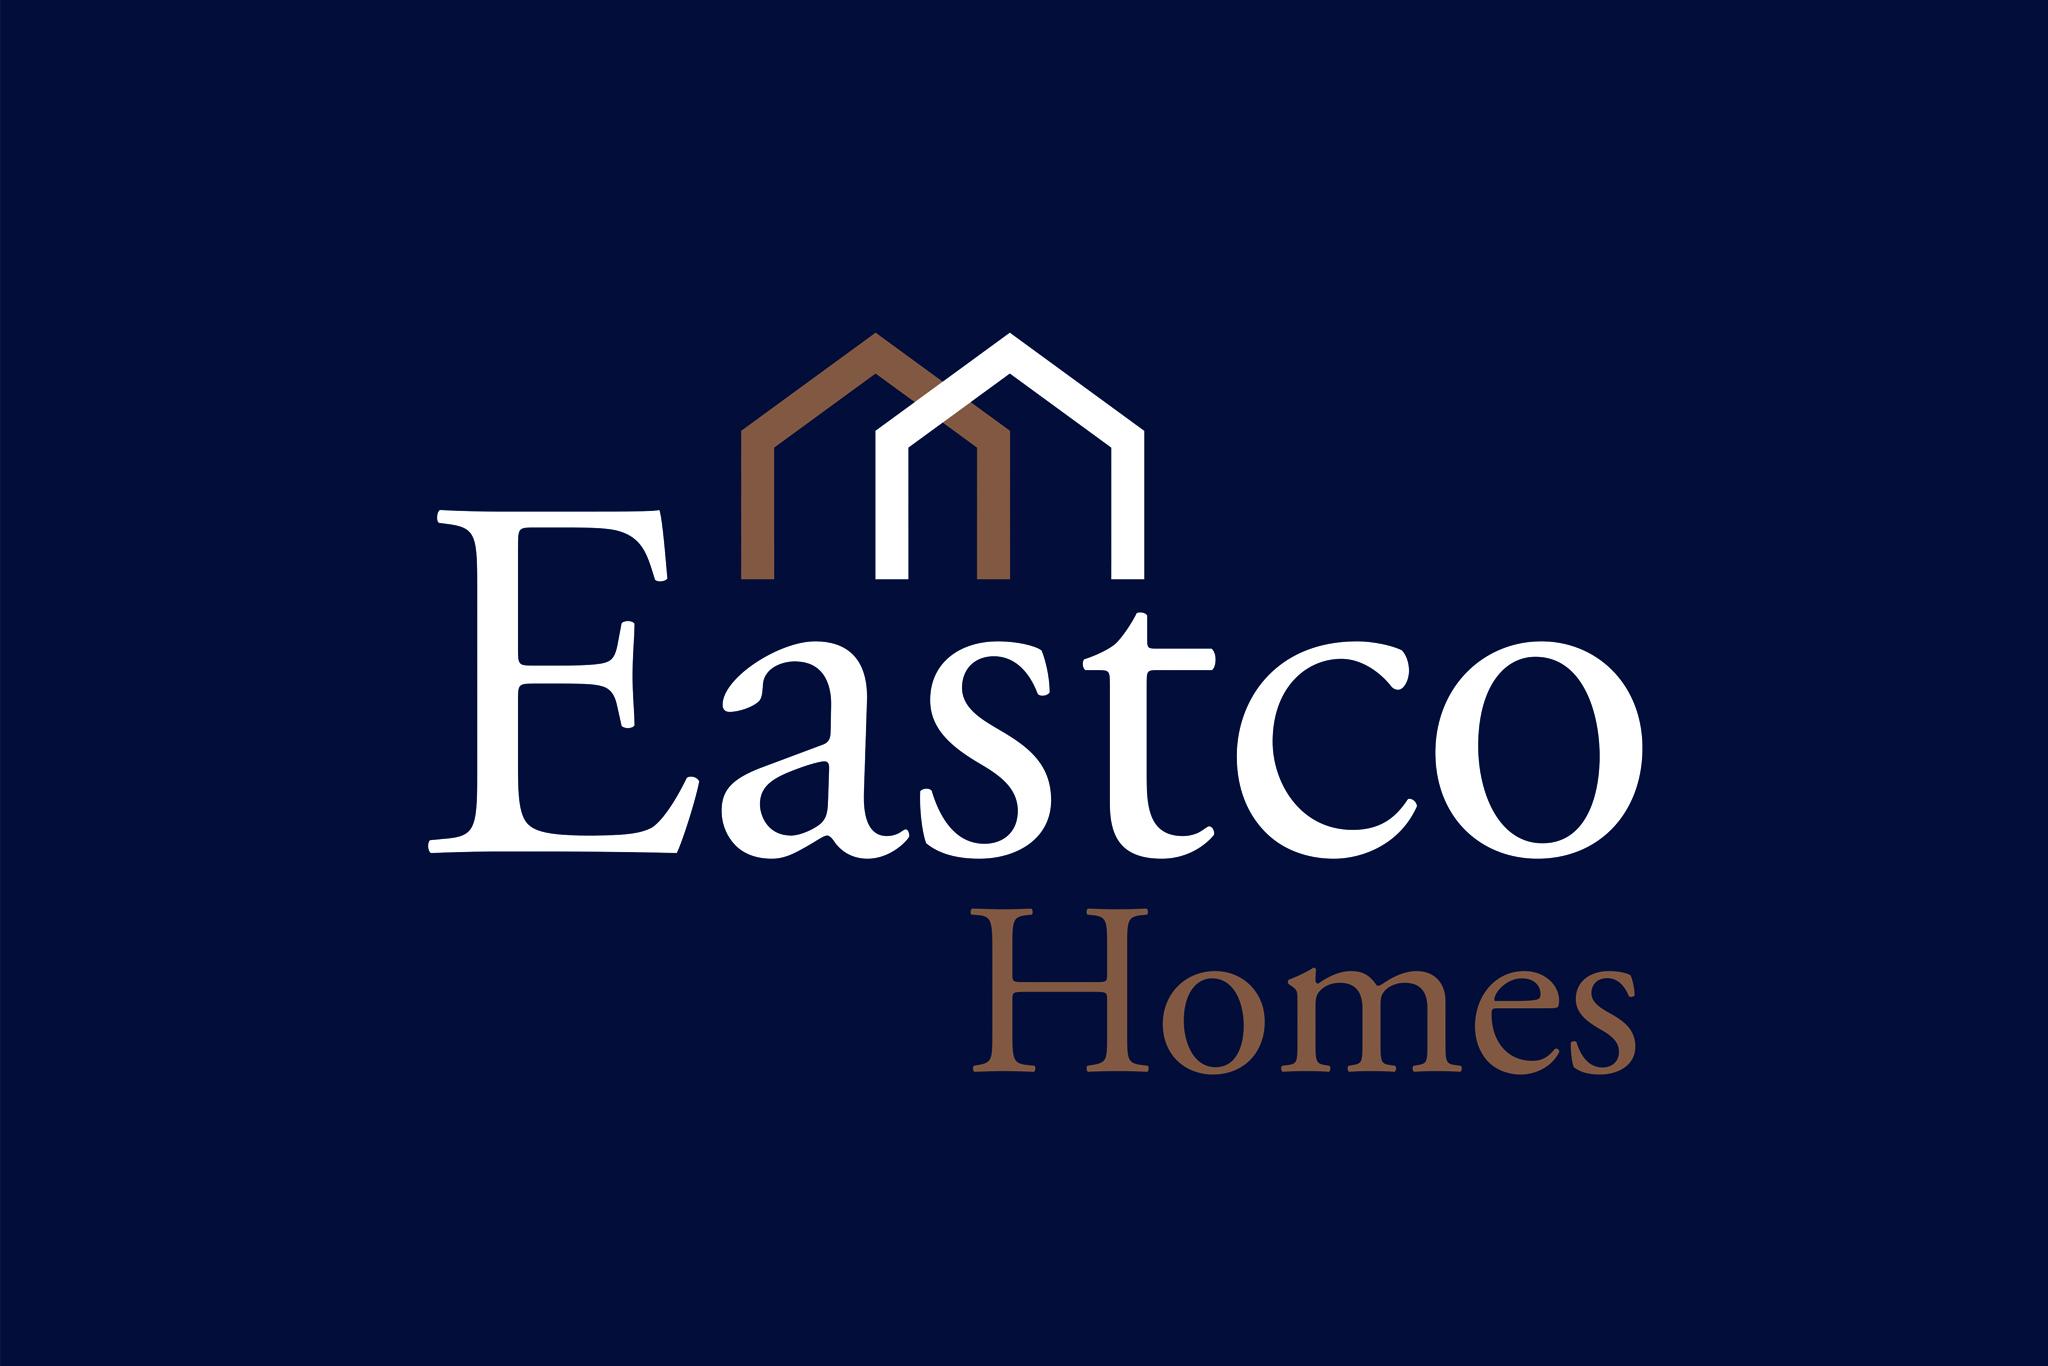 EastcoHomes_logo